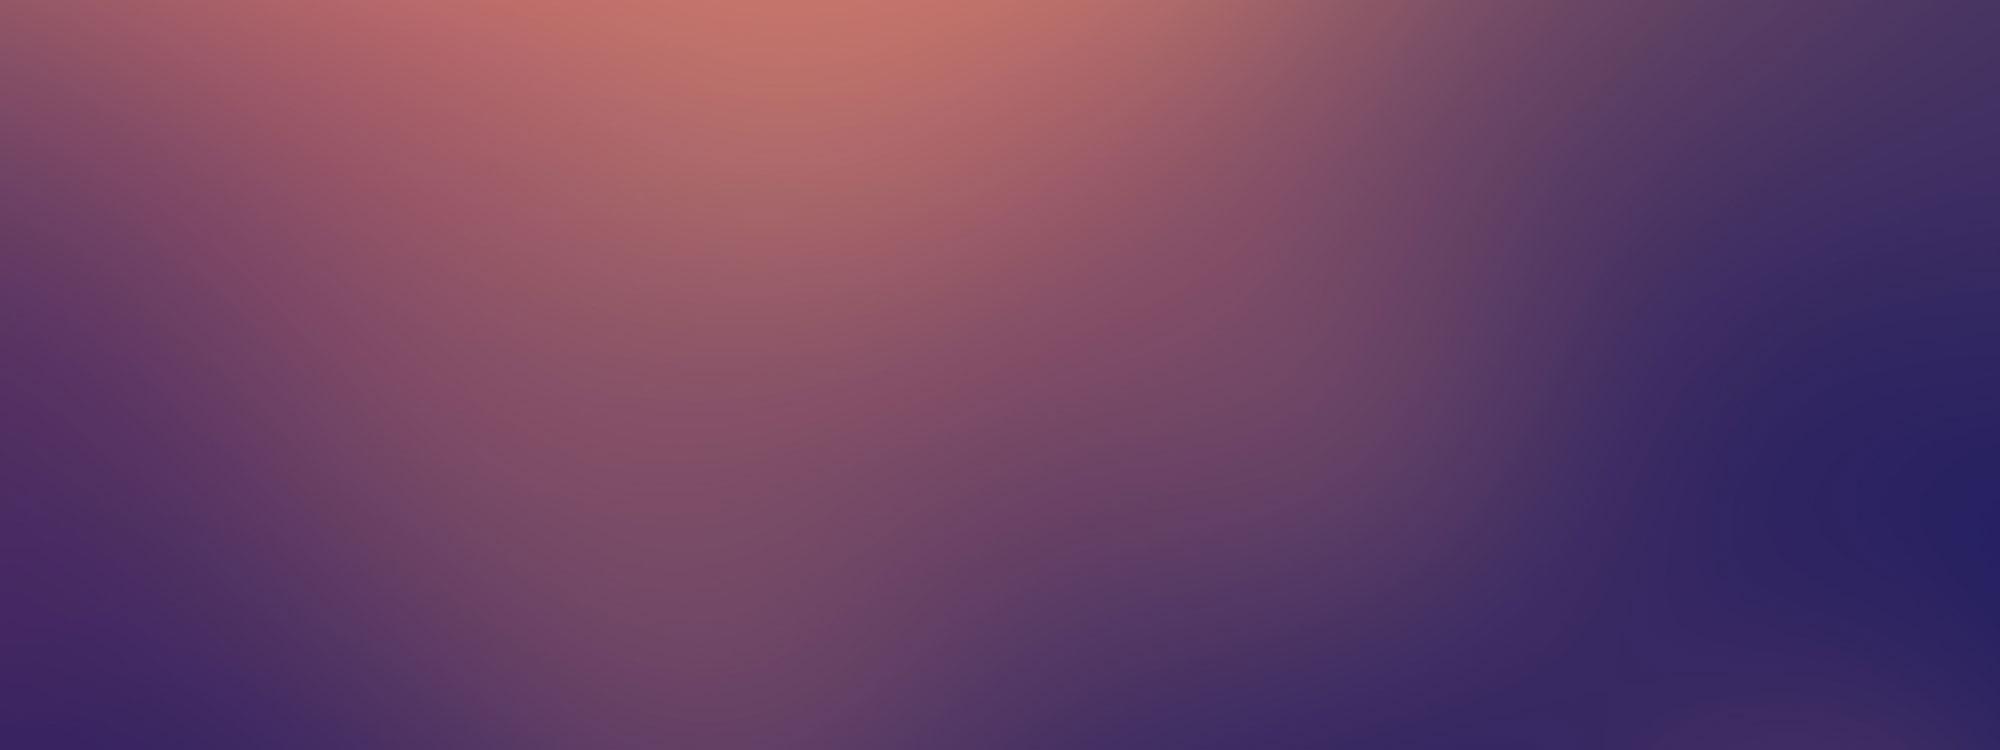 Blur_Background_October_2017_05